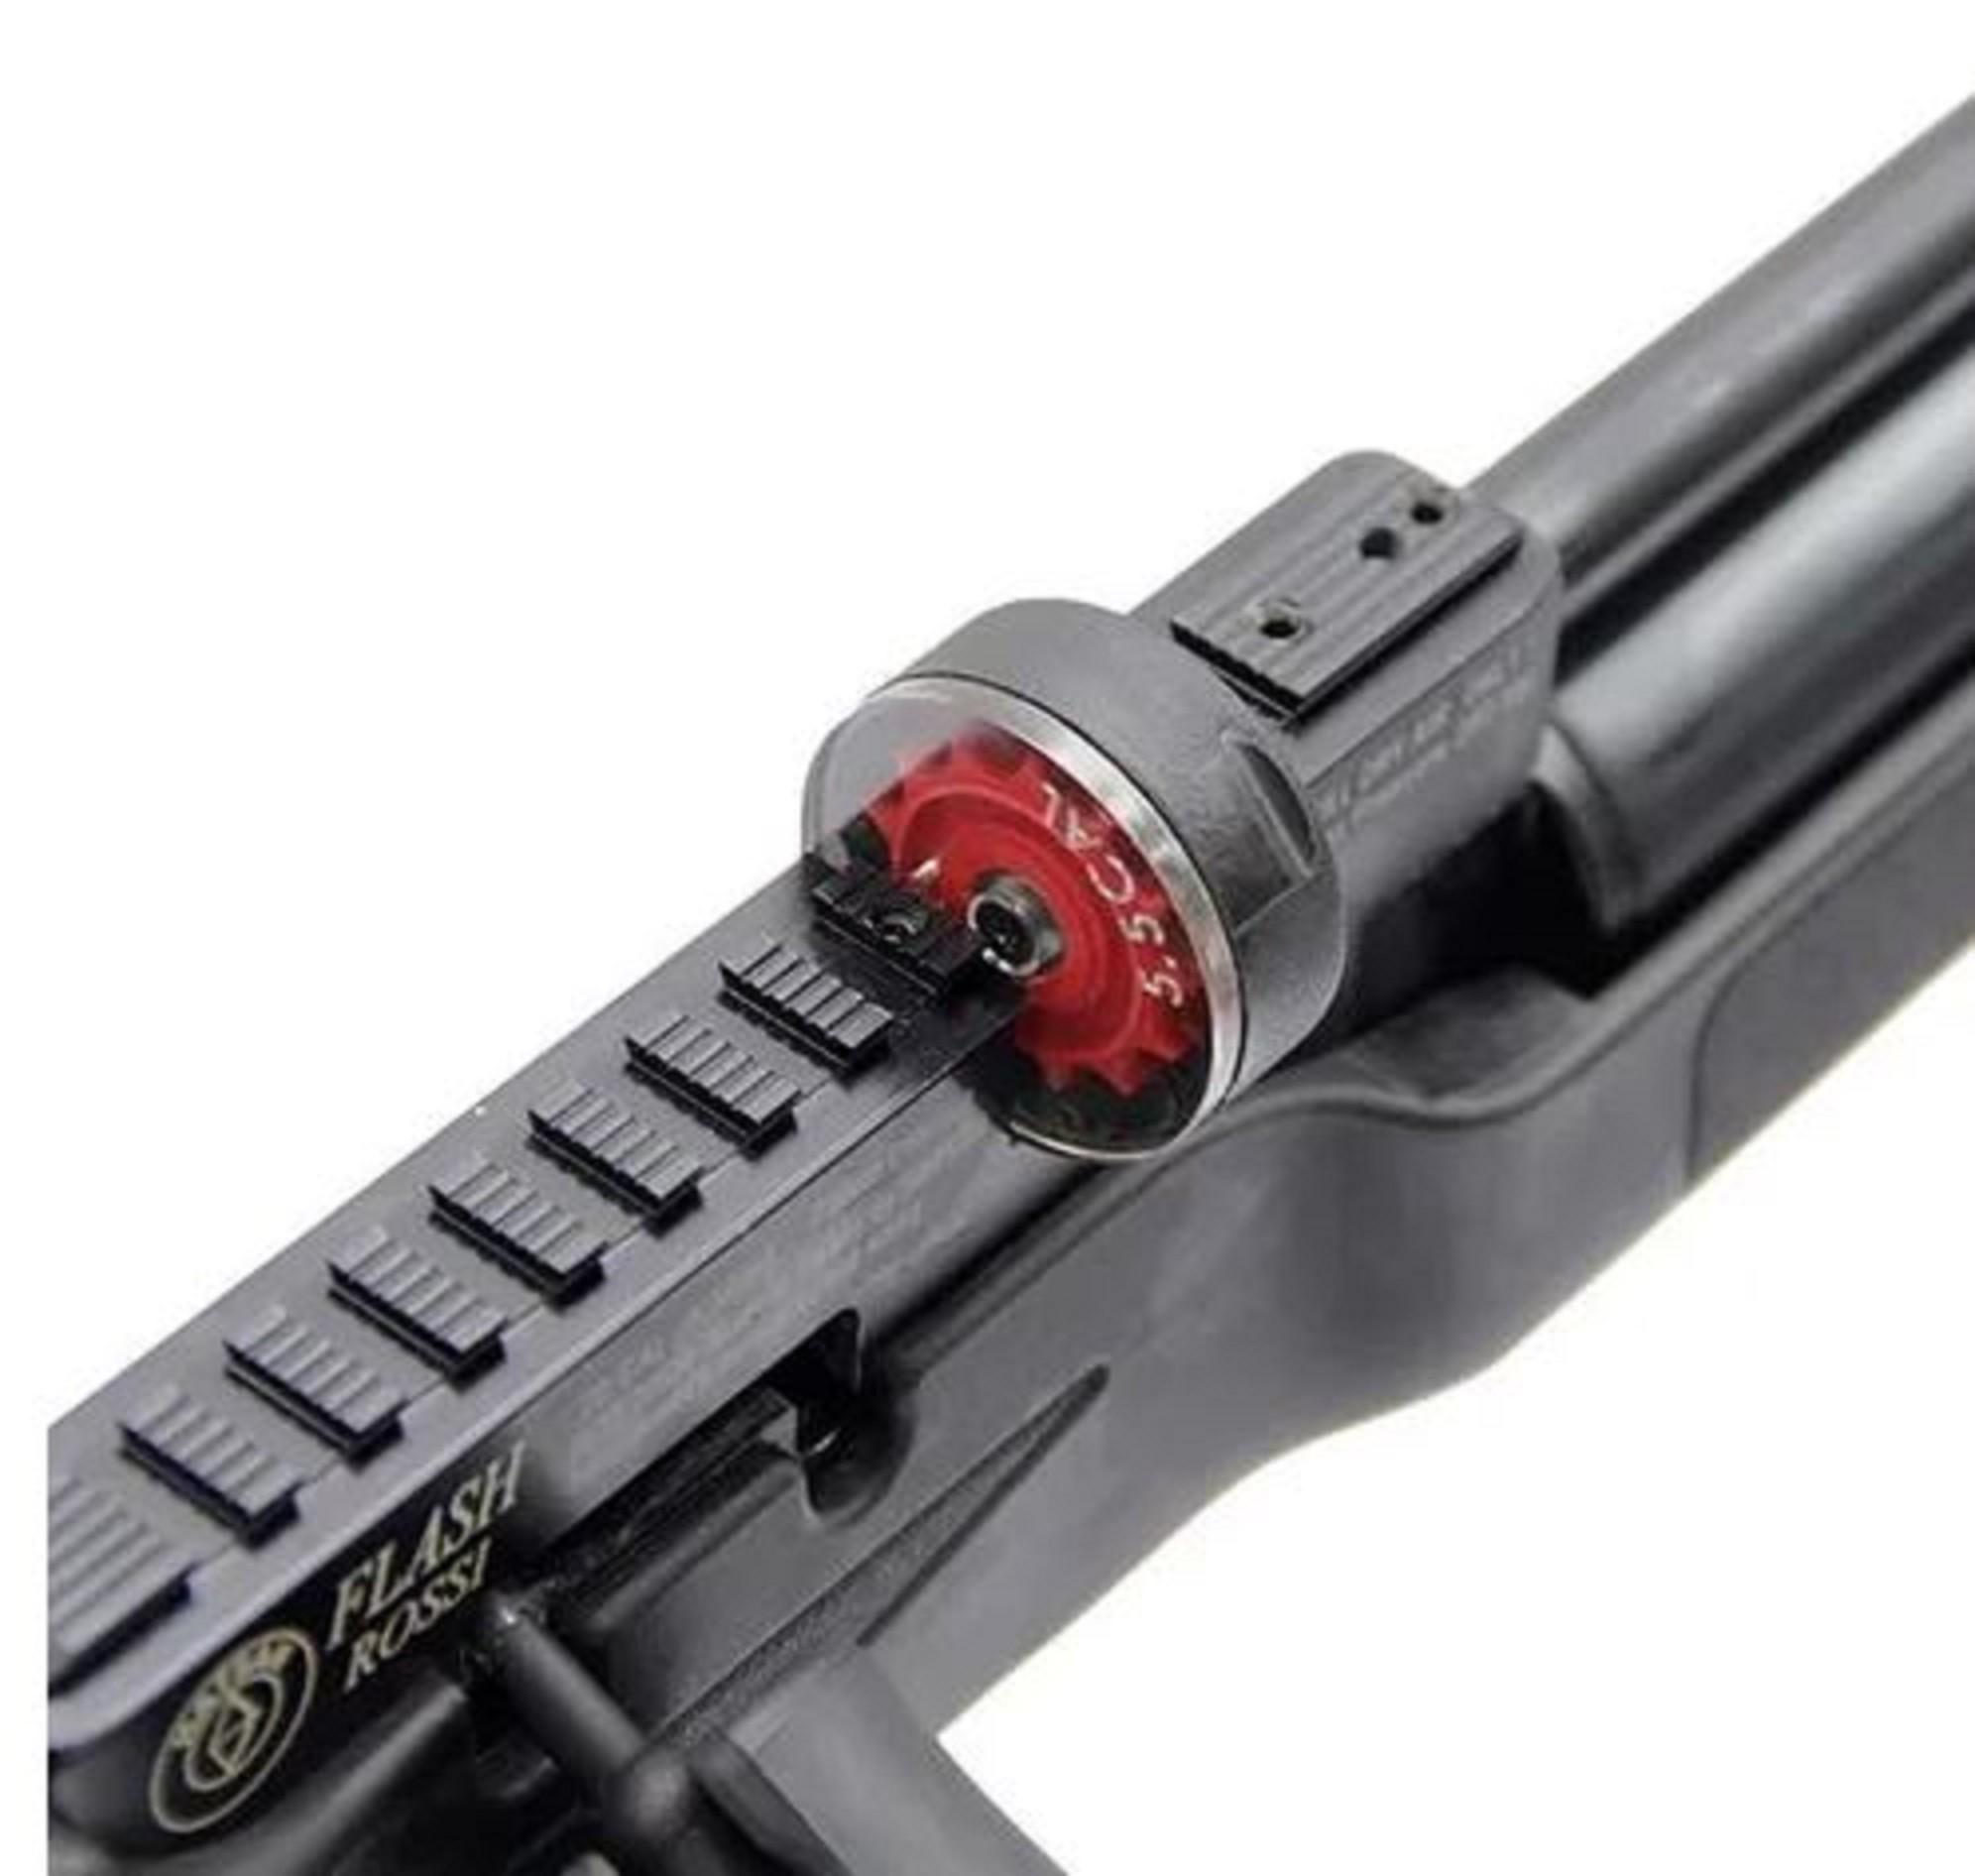 Carabina de Pressão PCP Hatsan Flash Synt 6,35mm